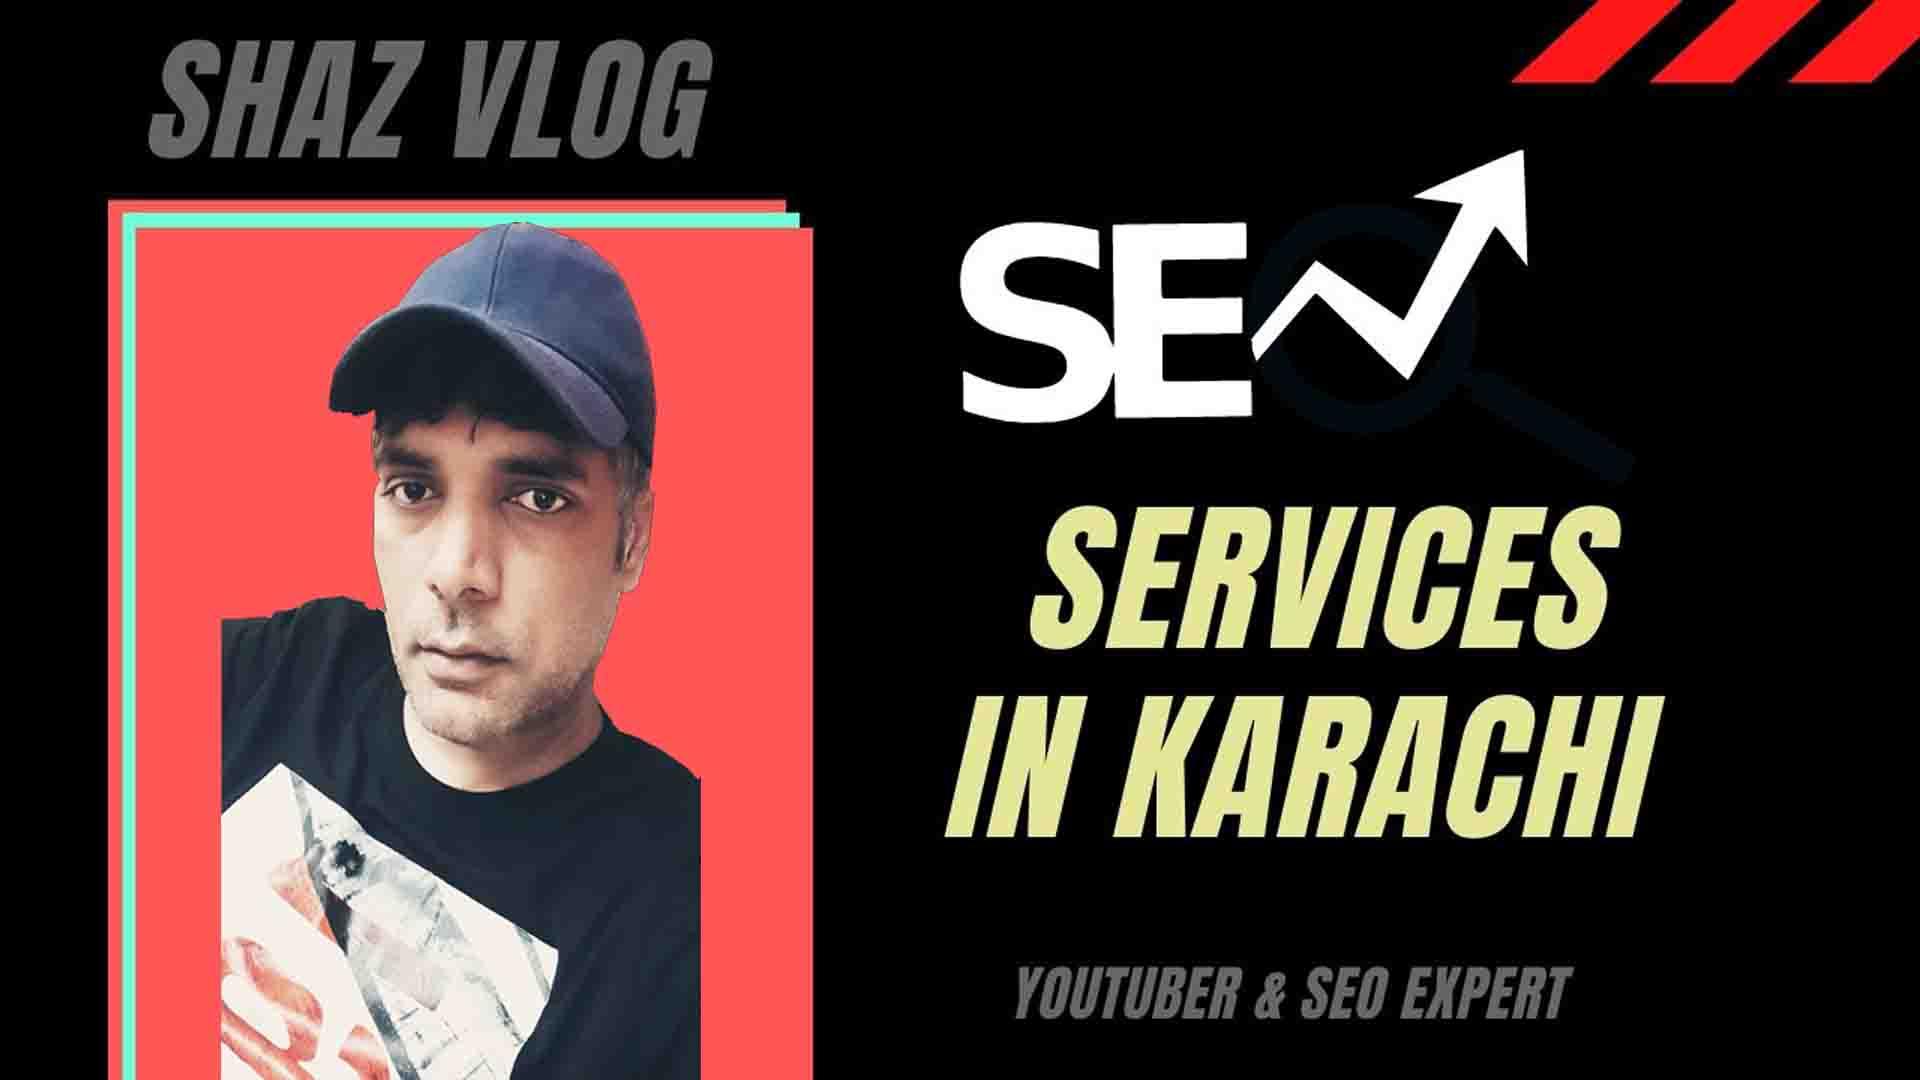 seo services in karachi